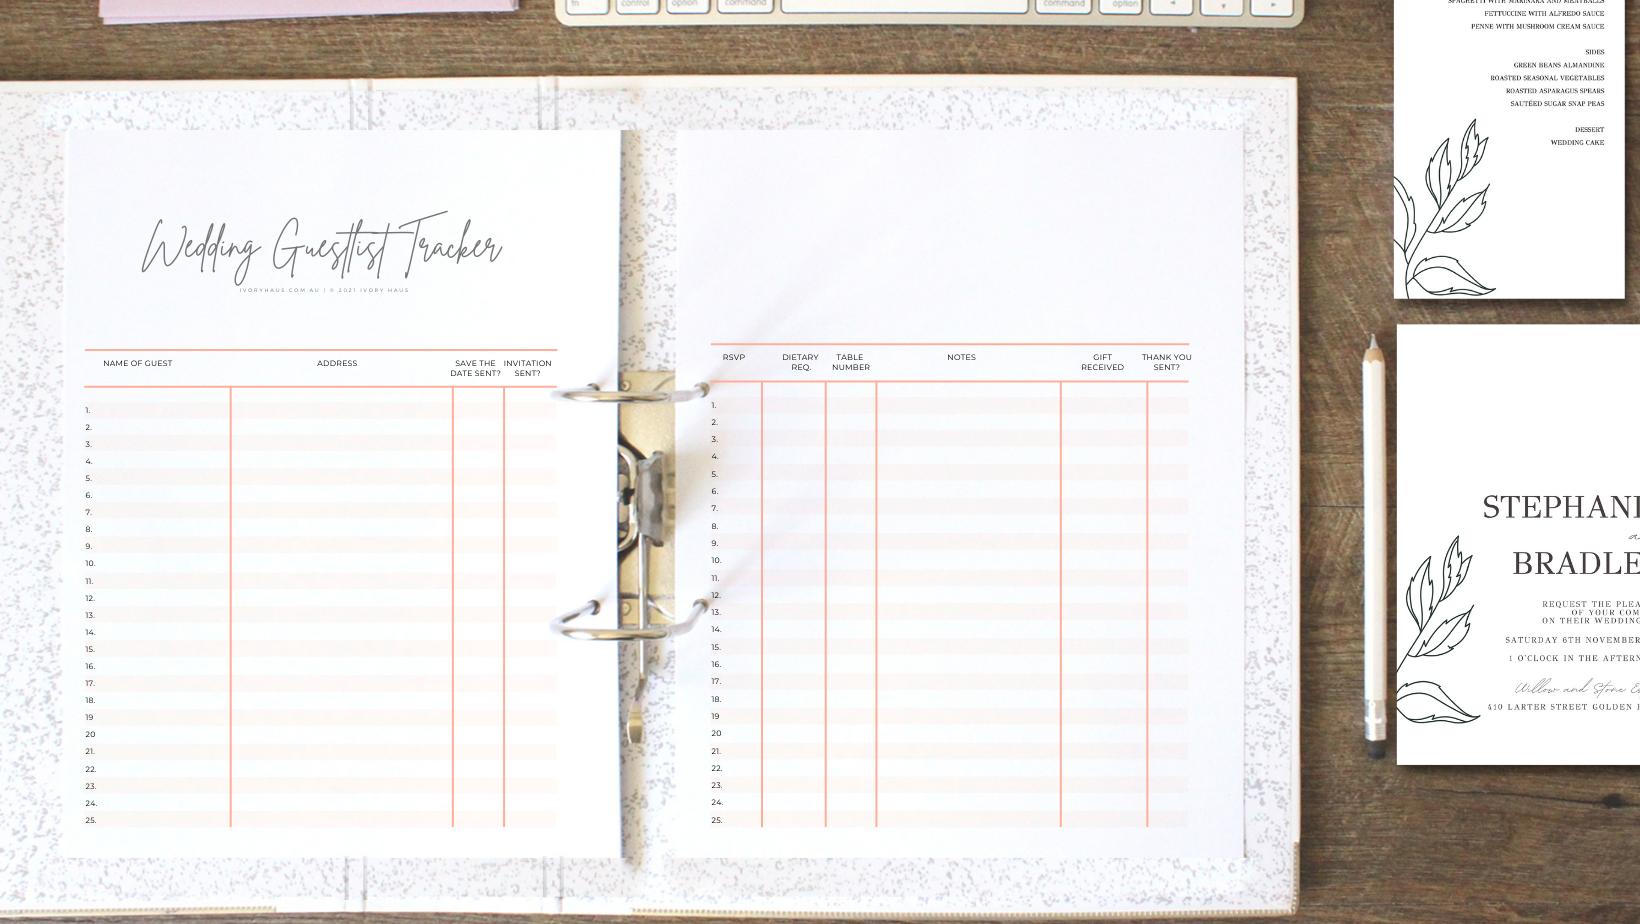 Wedding planner folder image